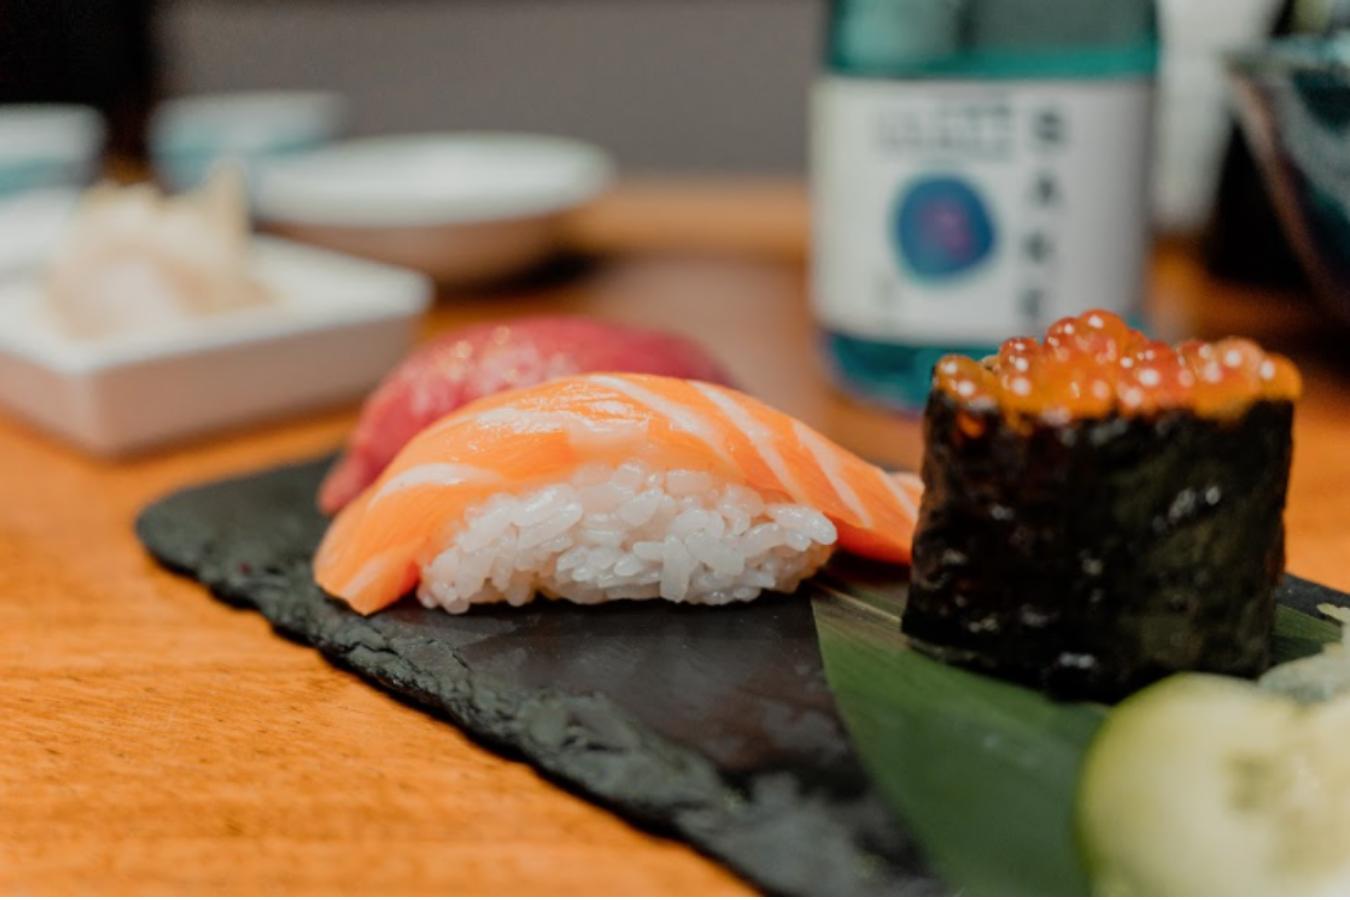 restaurante comida japonesa, comida japonesa